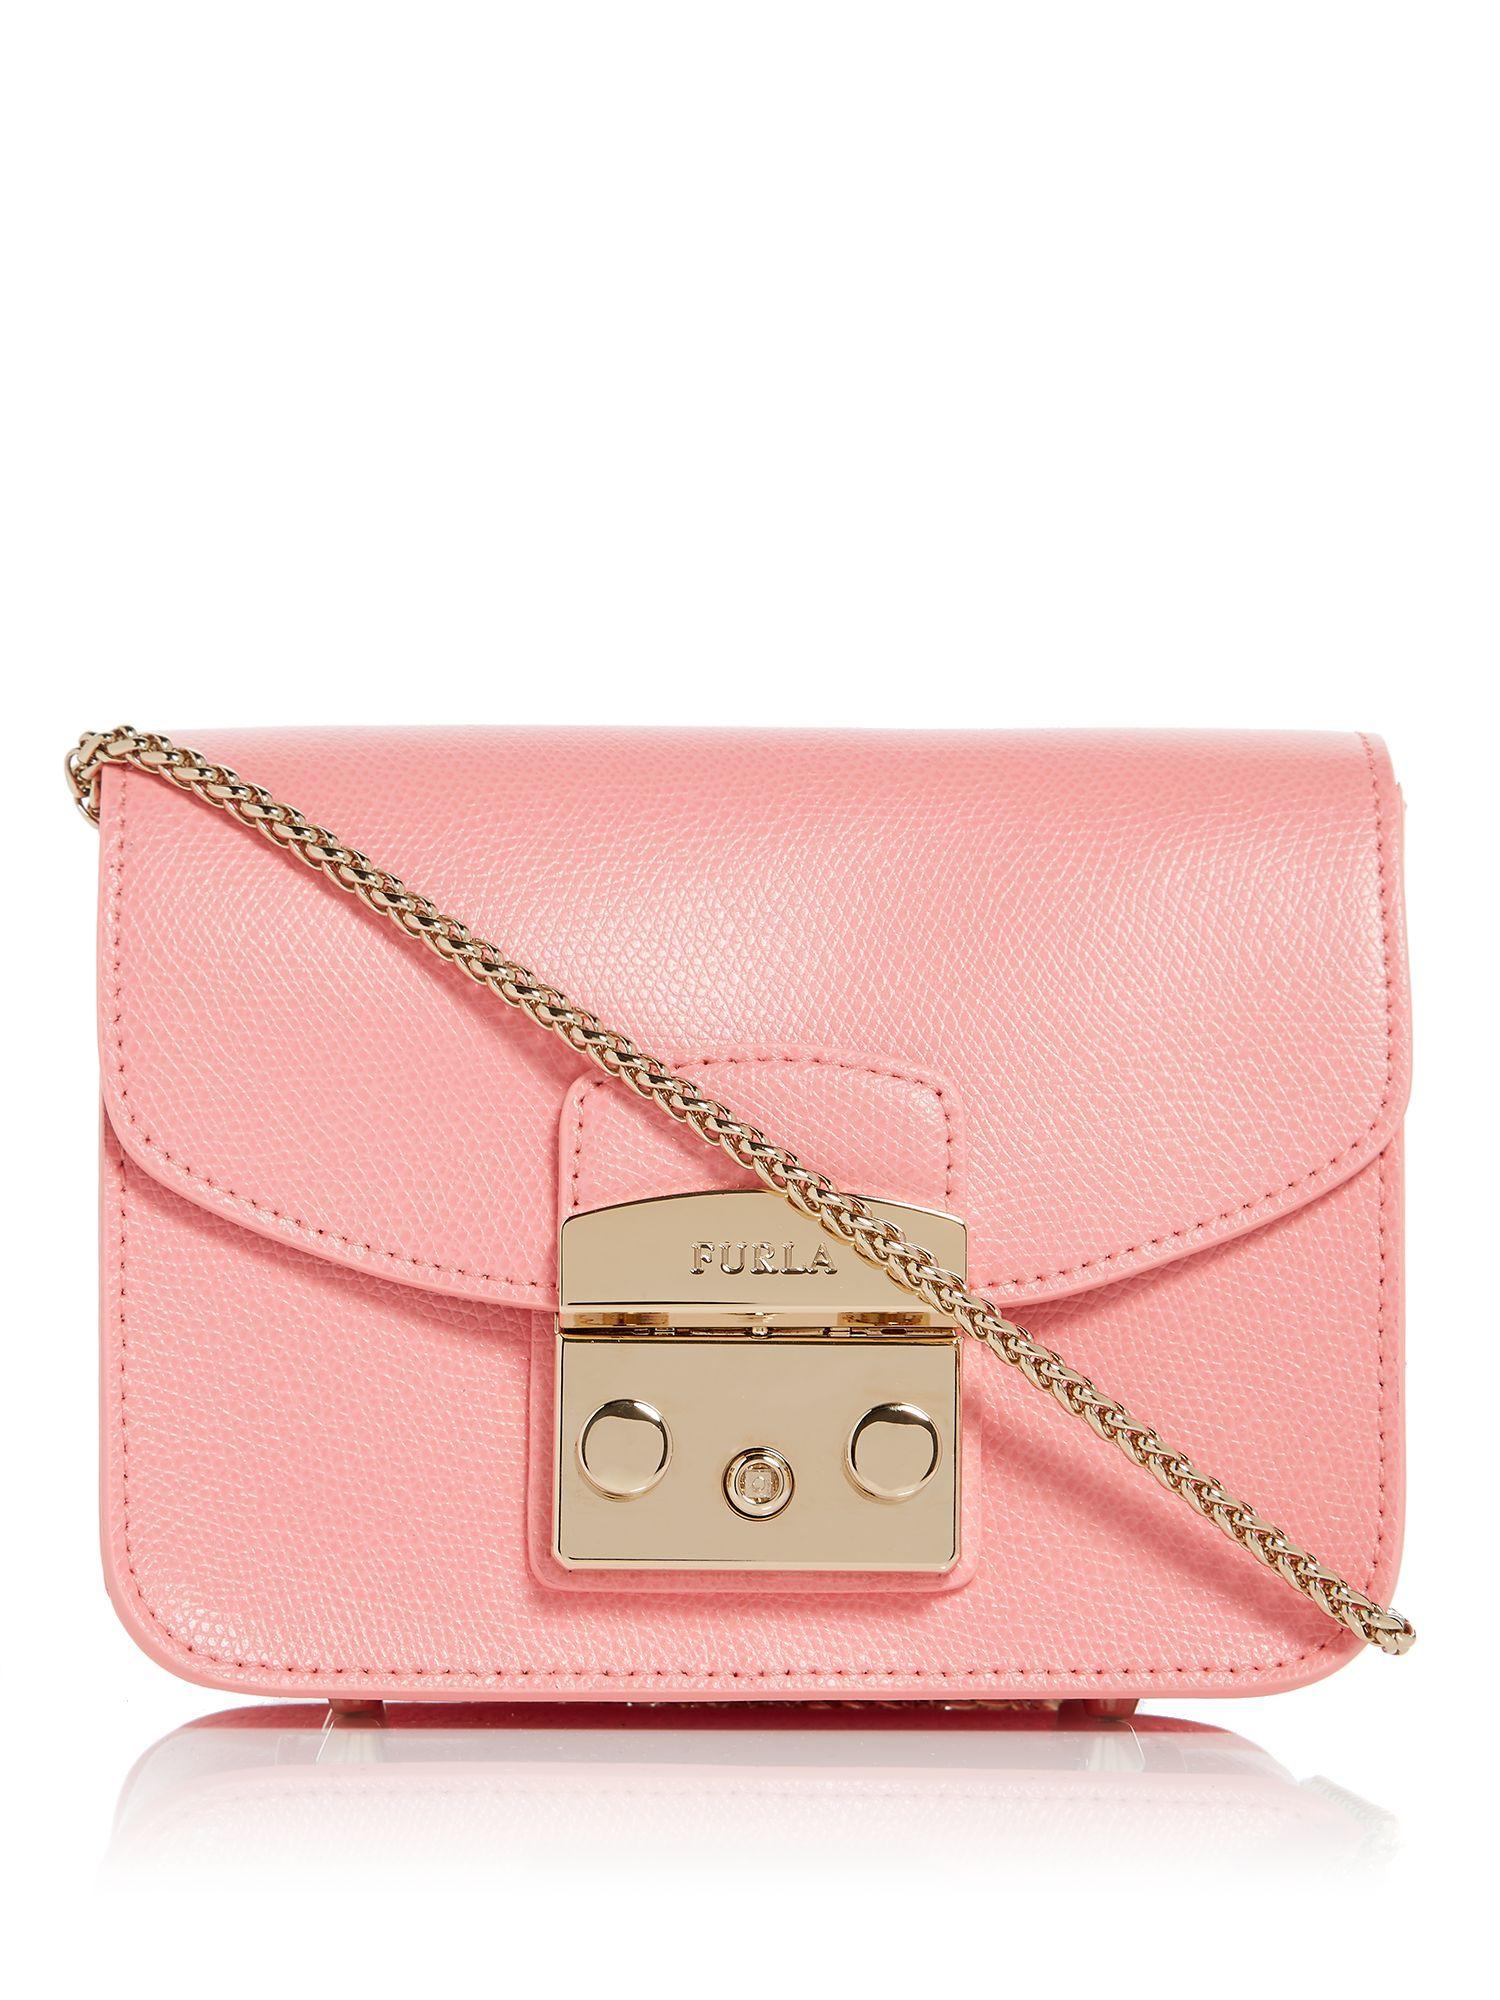 8f1dd45e557 FURLA Metropolis Mini Cross Body Bag | Furla Bags & Handbags | Bags ...